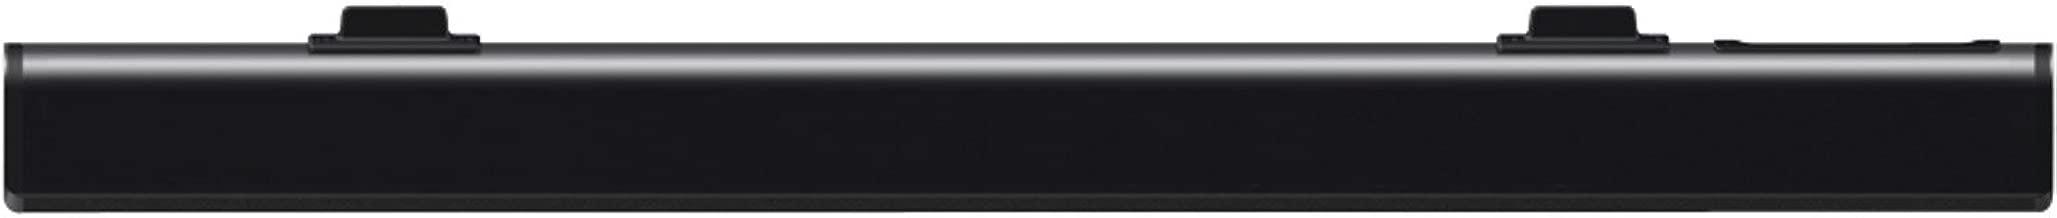 Naxa Electronics NHS-2007 42-Inch Wireless Sound Bar System with Bluetooth